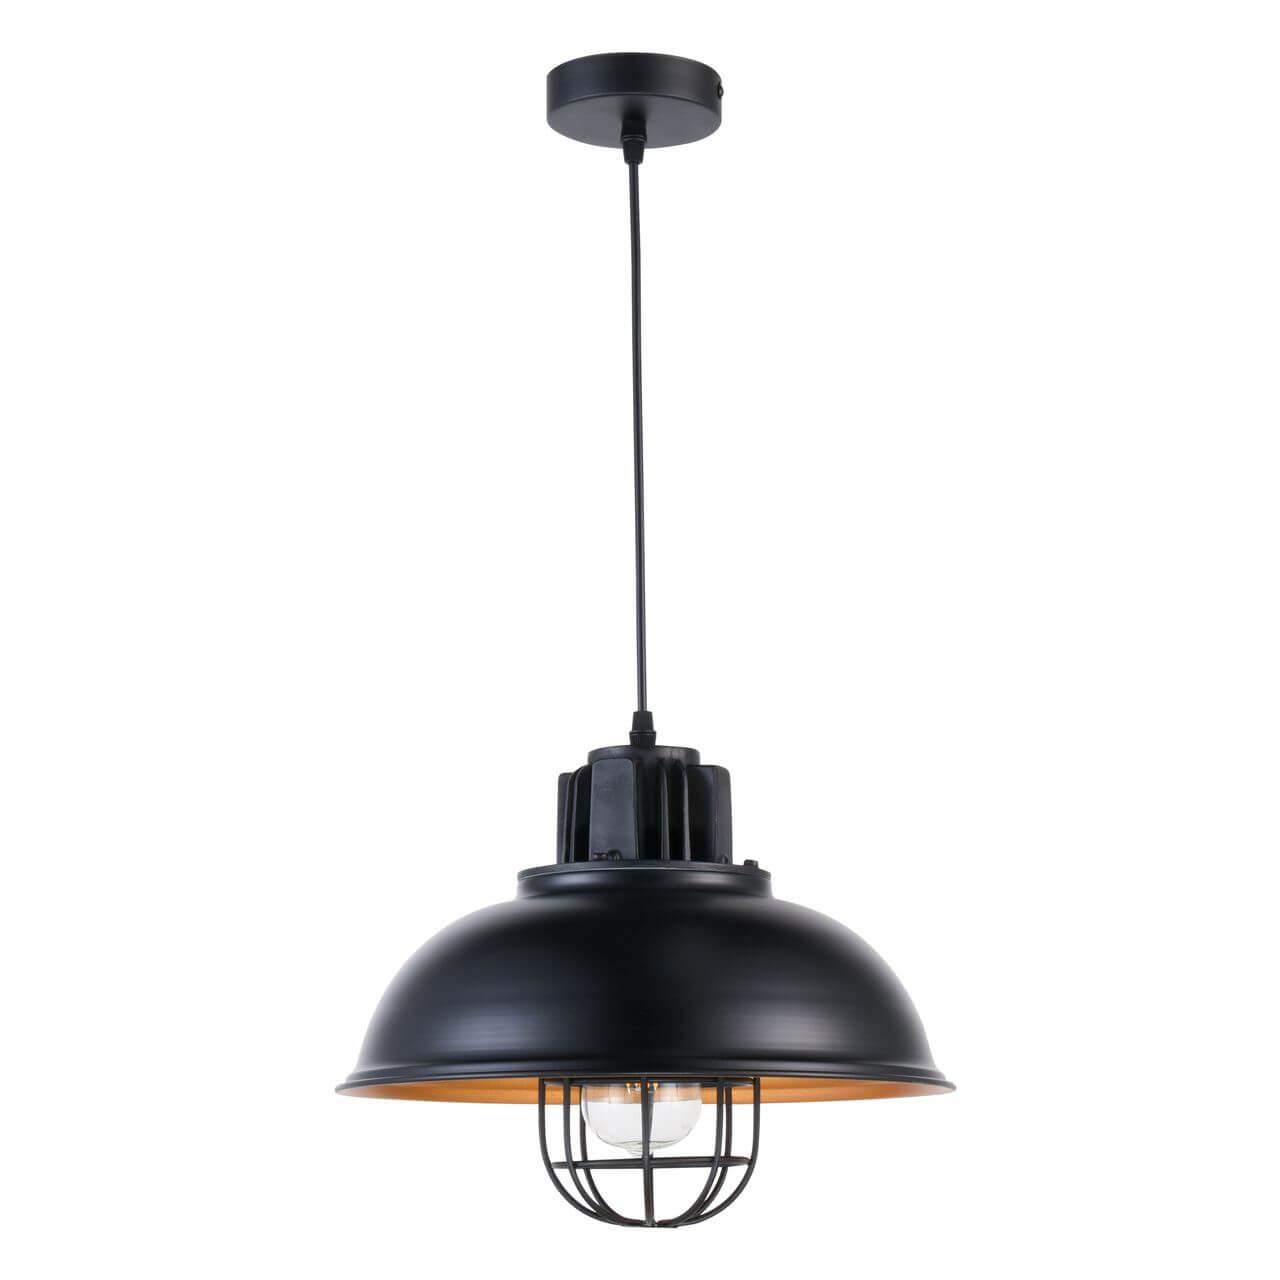 Светильник Fametto DLC-V304 E27 Black Vintage